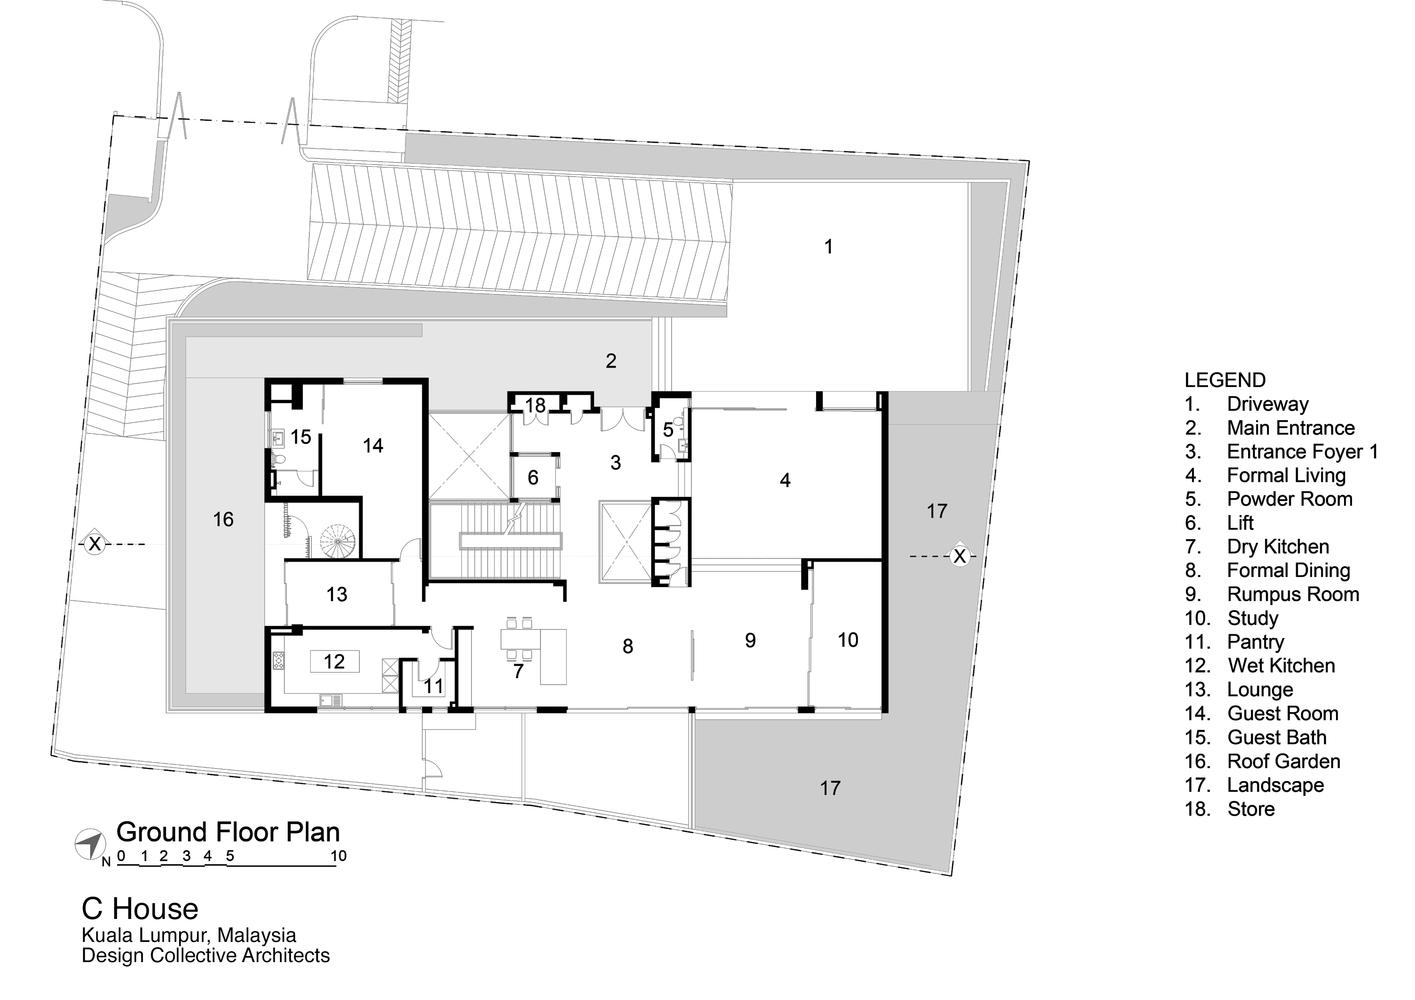 C house design collective architect ground floor plan